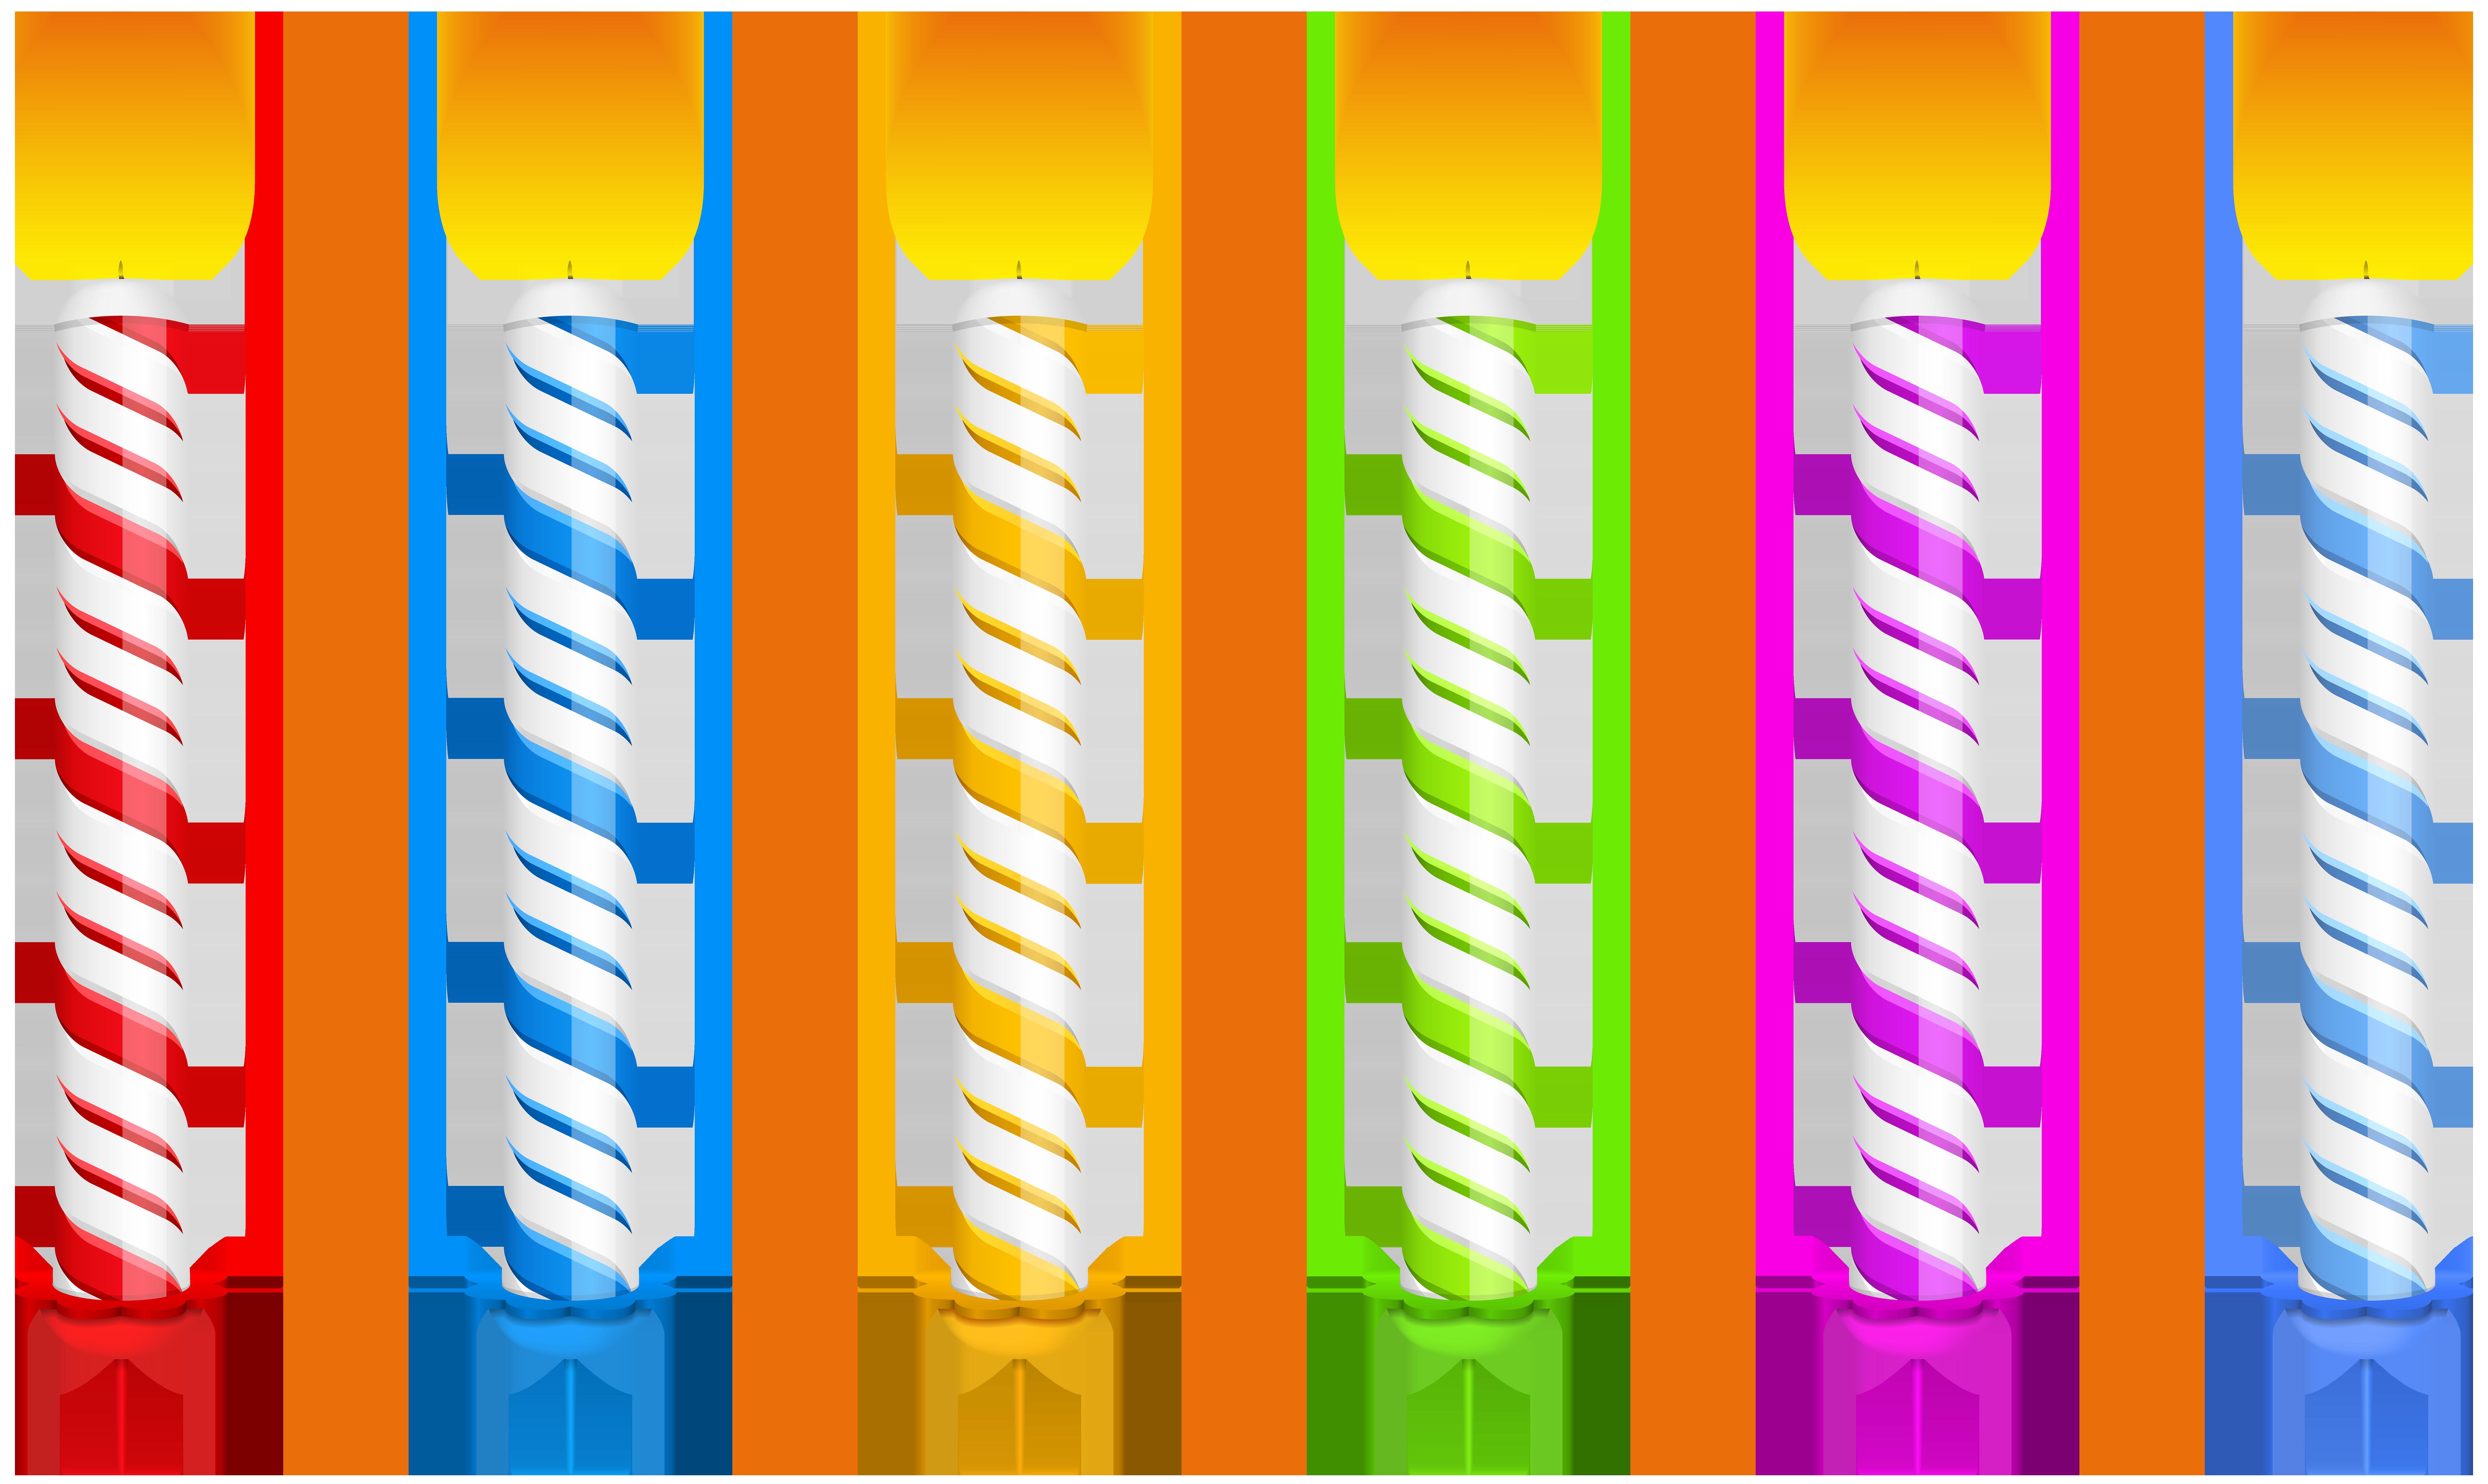 8000x4772 Birthday Candles Transparent Png Clip Art Imageu200b Gallery